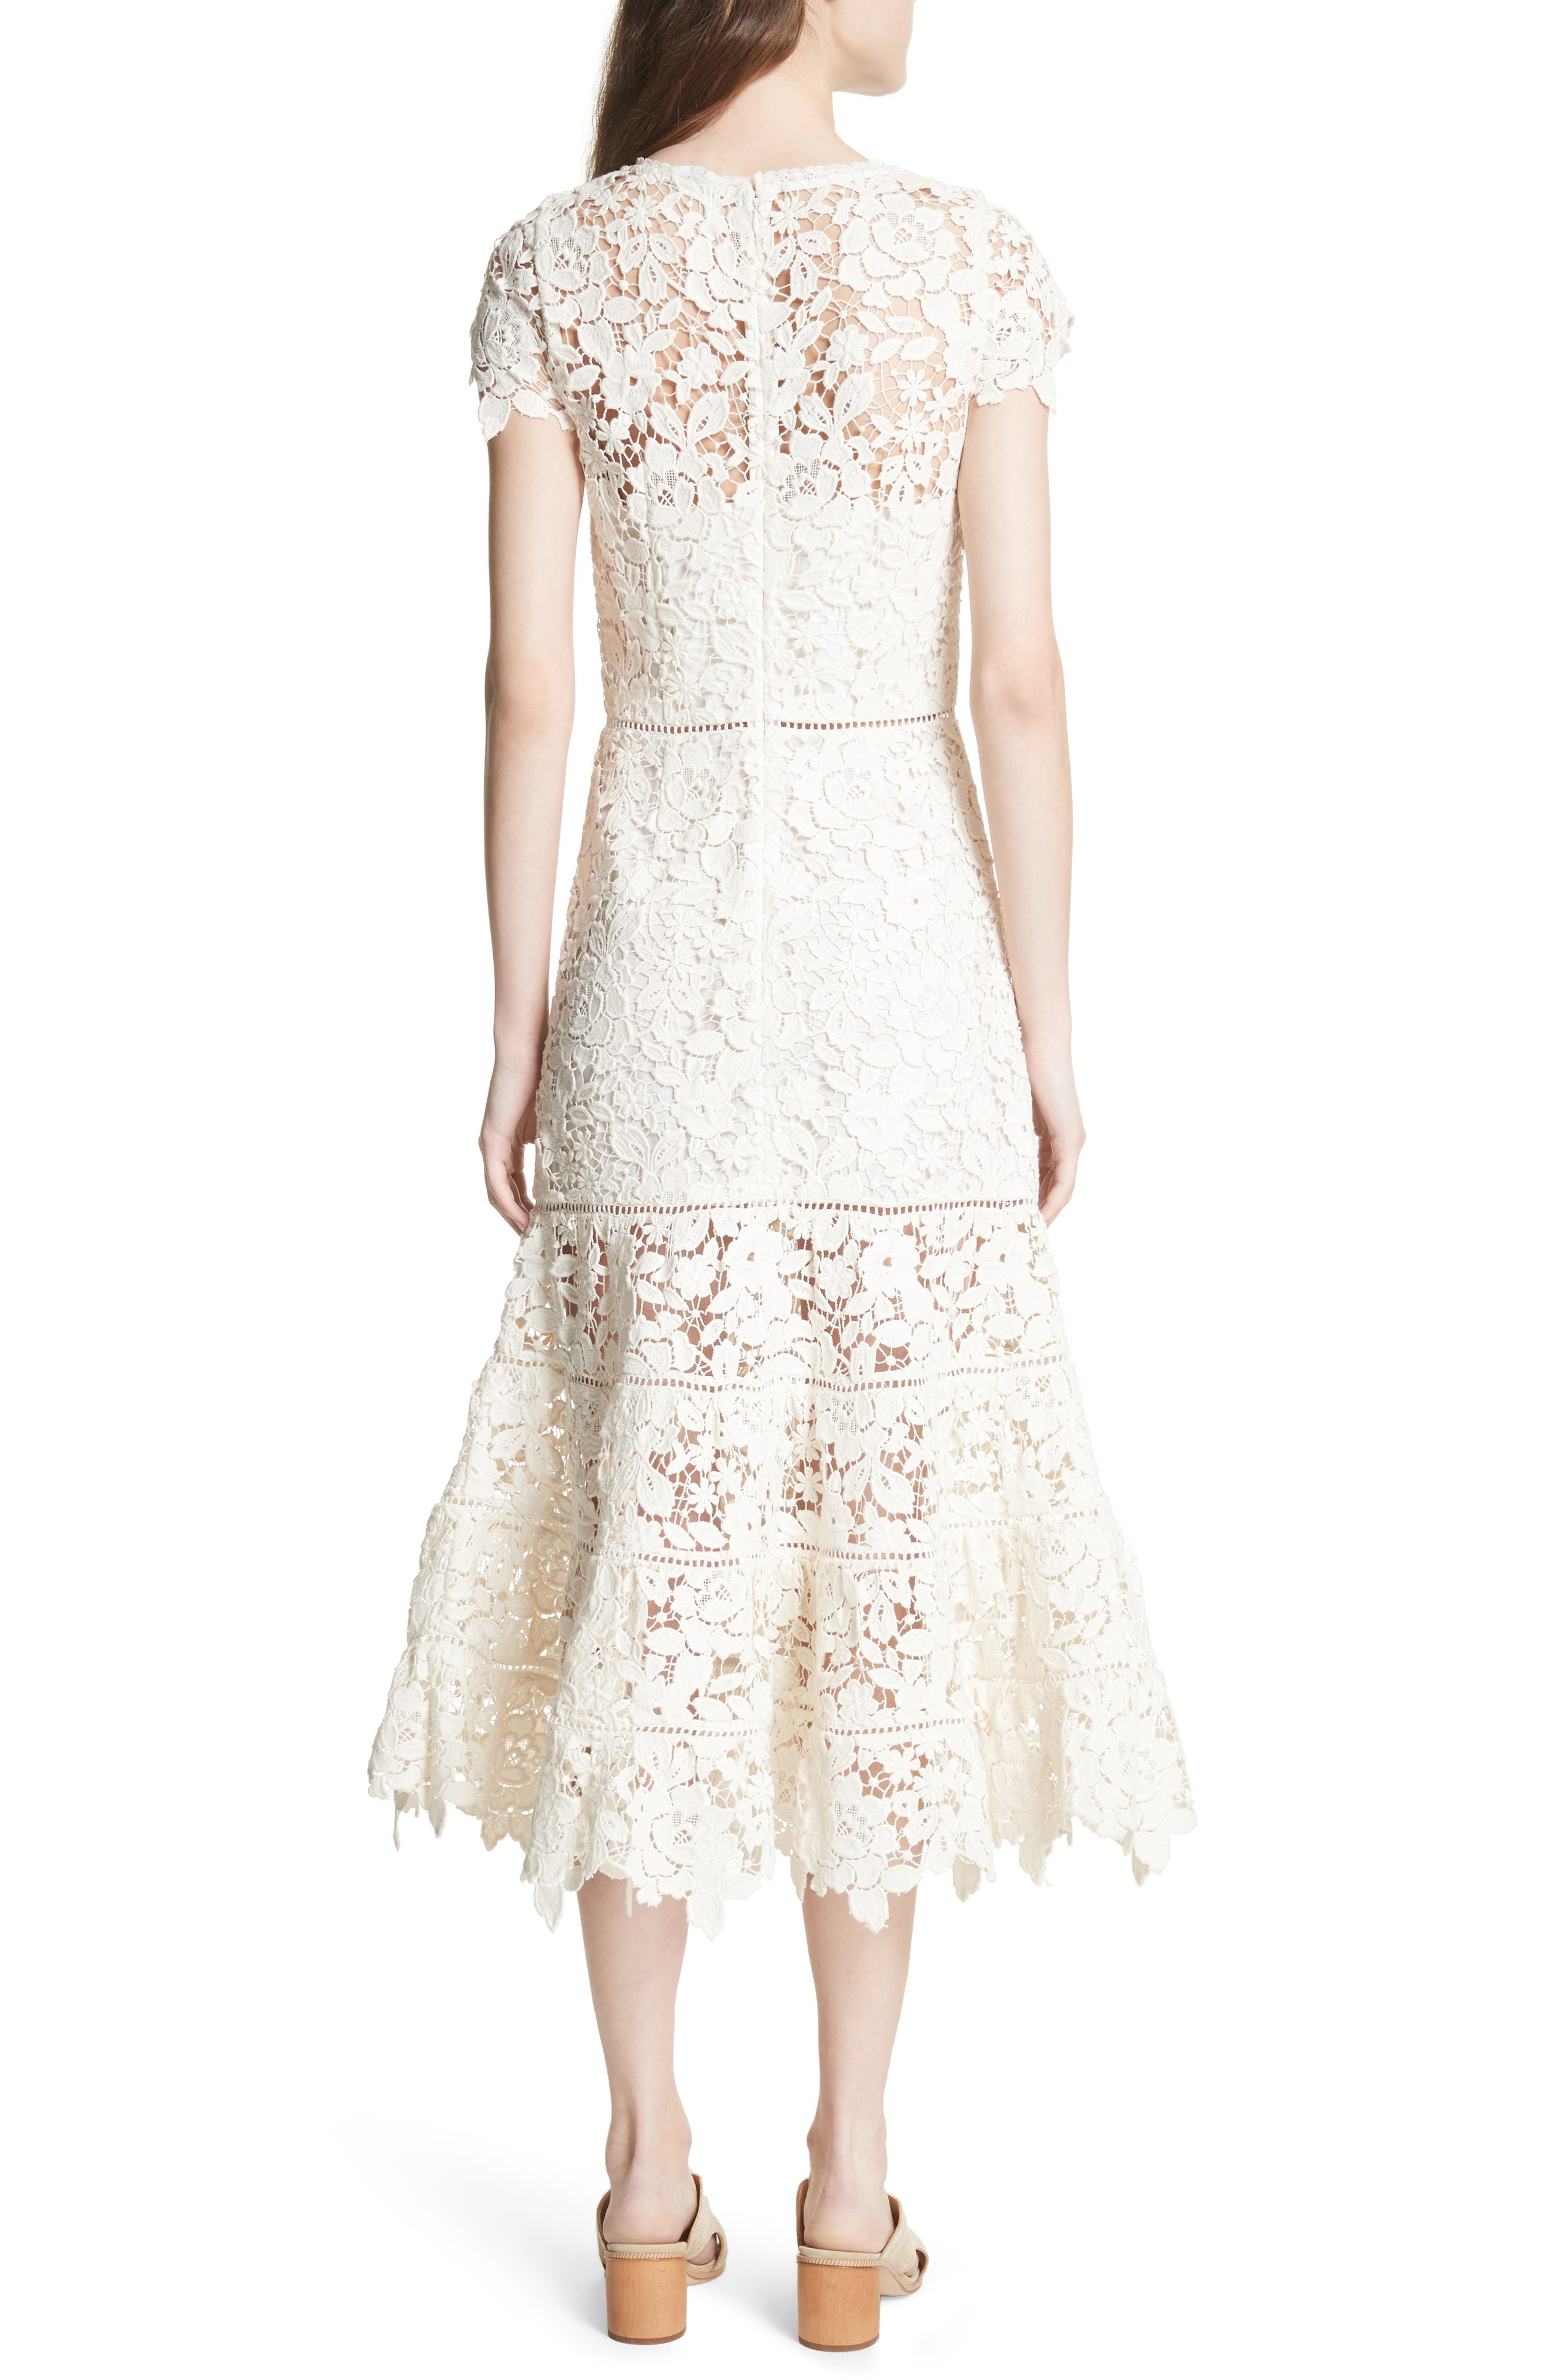 Celedonia Scallop Lace Dress,                             Alternate thumbnail 2, color,                             120